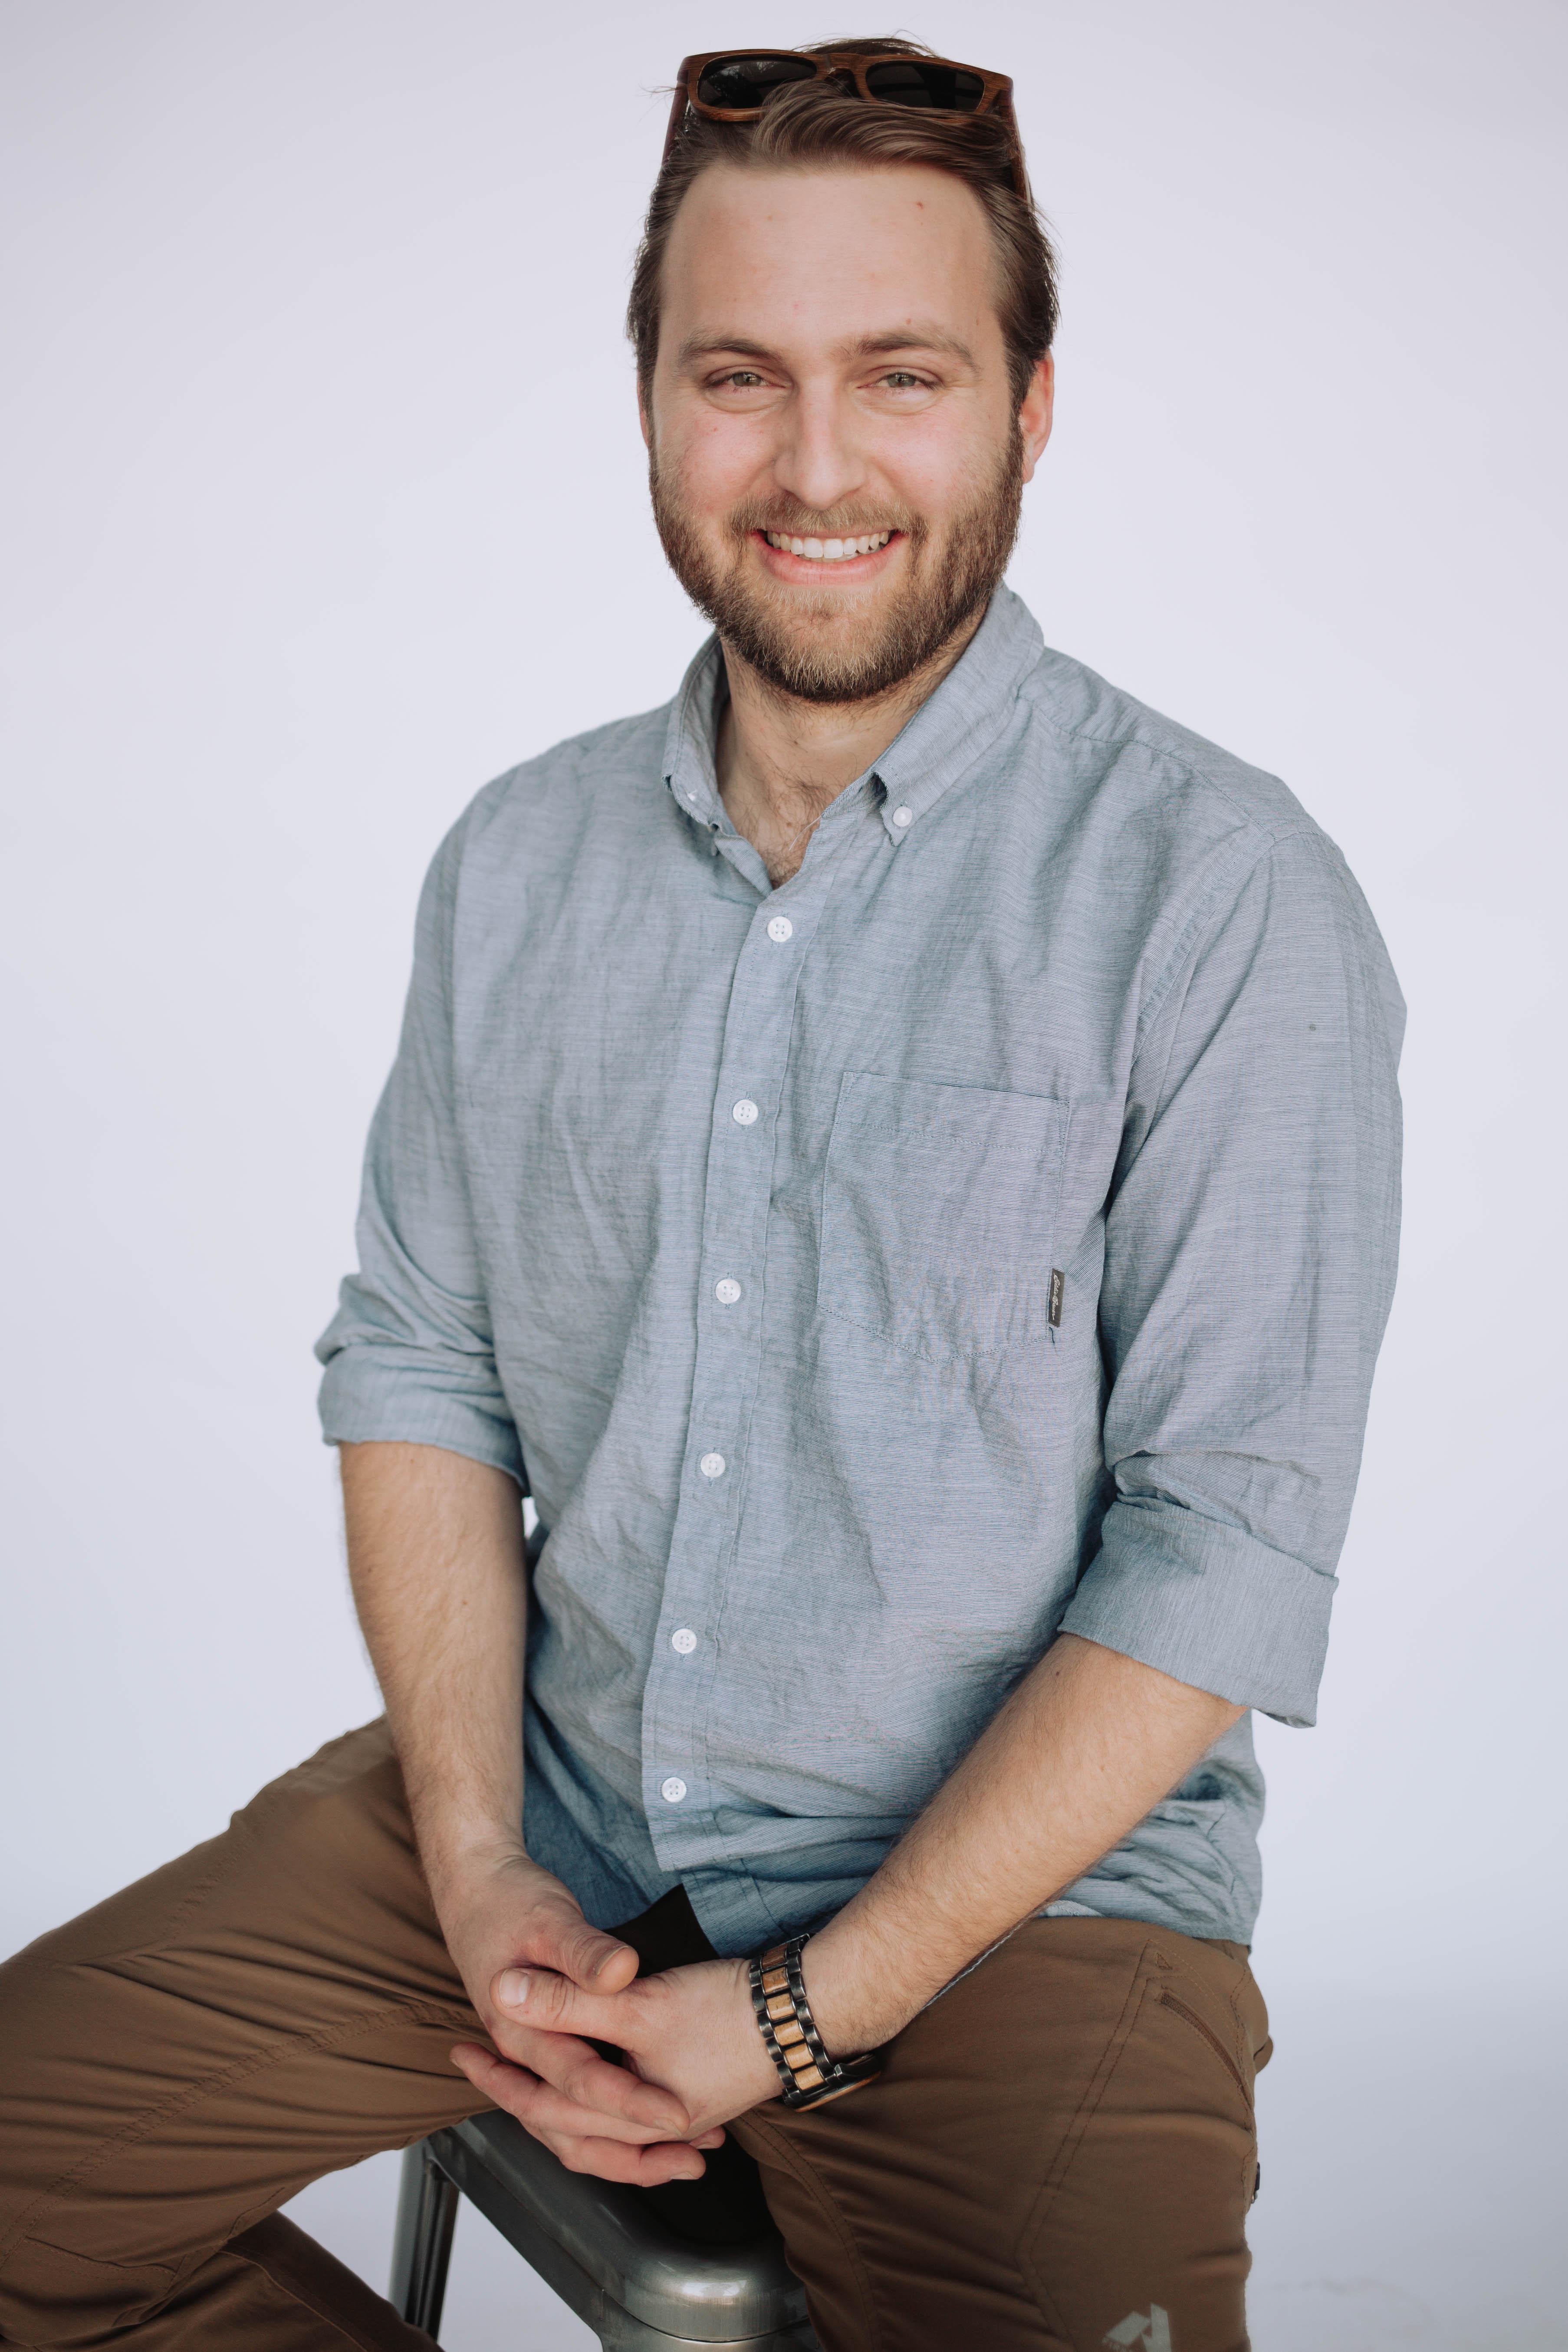 Brandon Prange